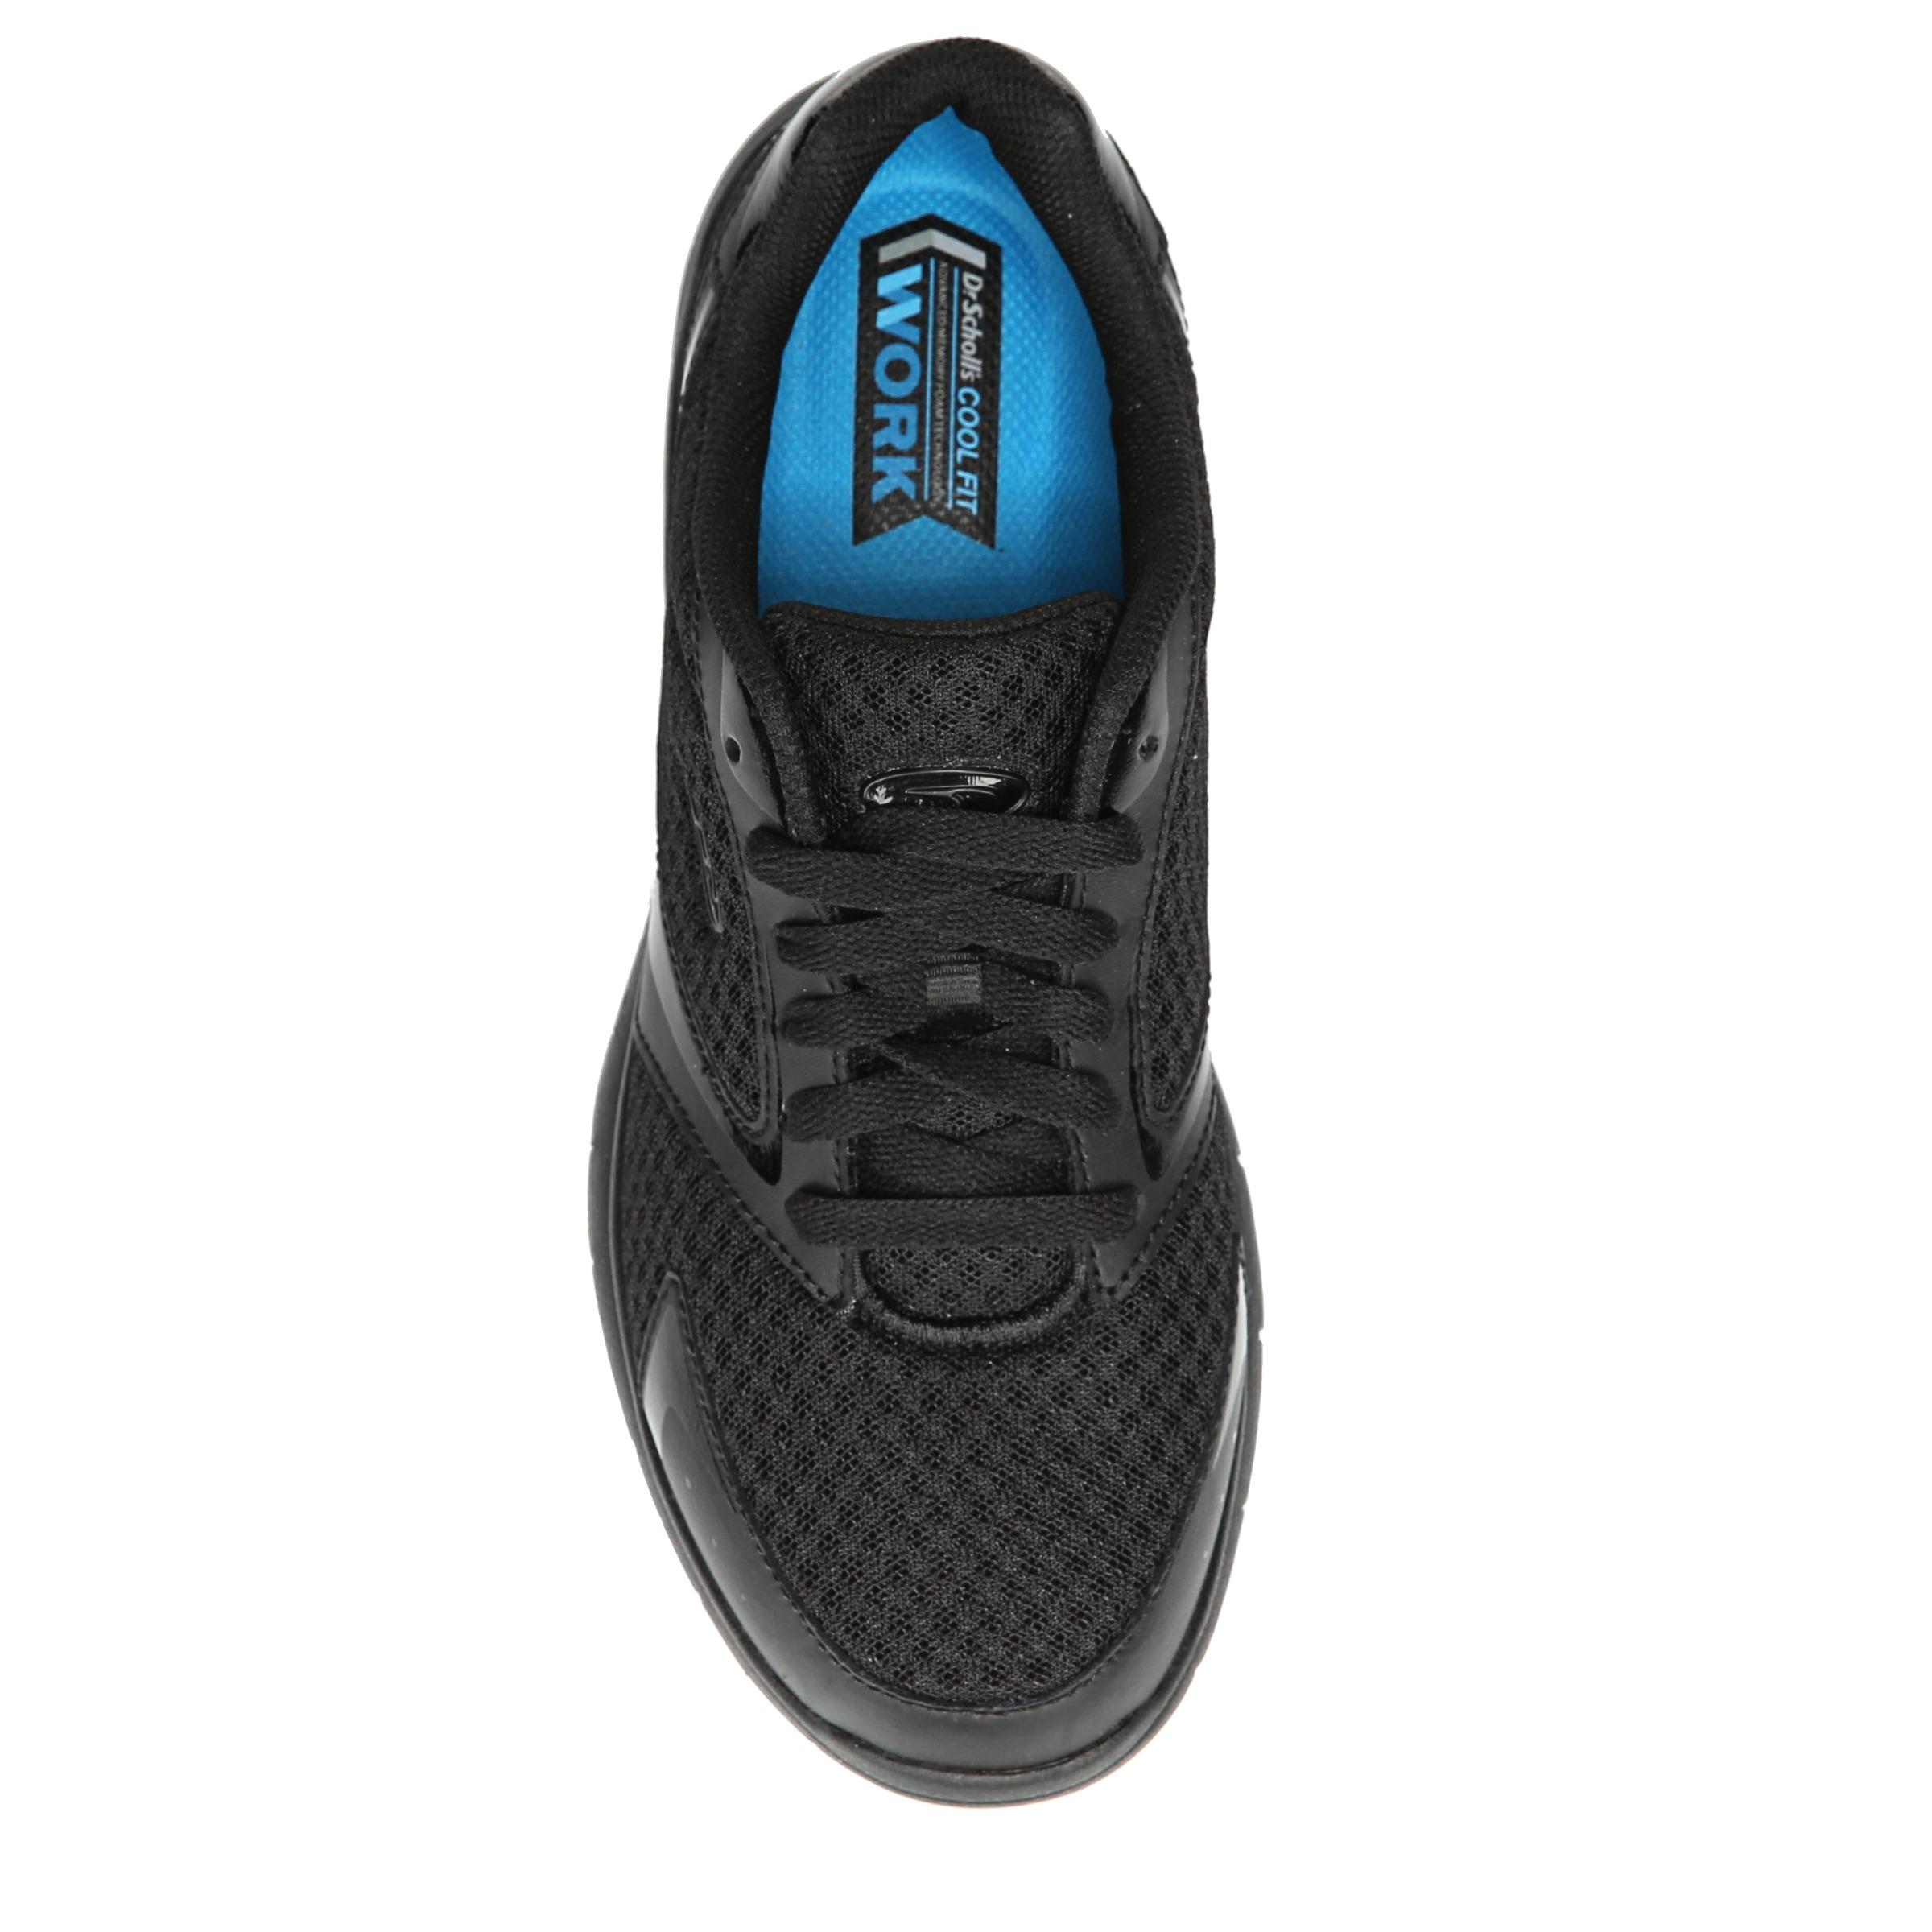 ecd0b1357324 Dr. Scholl s Inhale Women s Slip Resistant Black Athletic Work Shoe ...